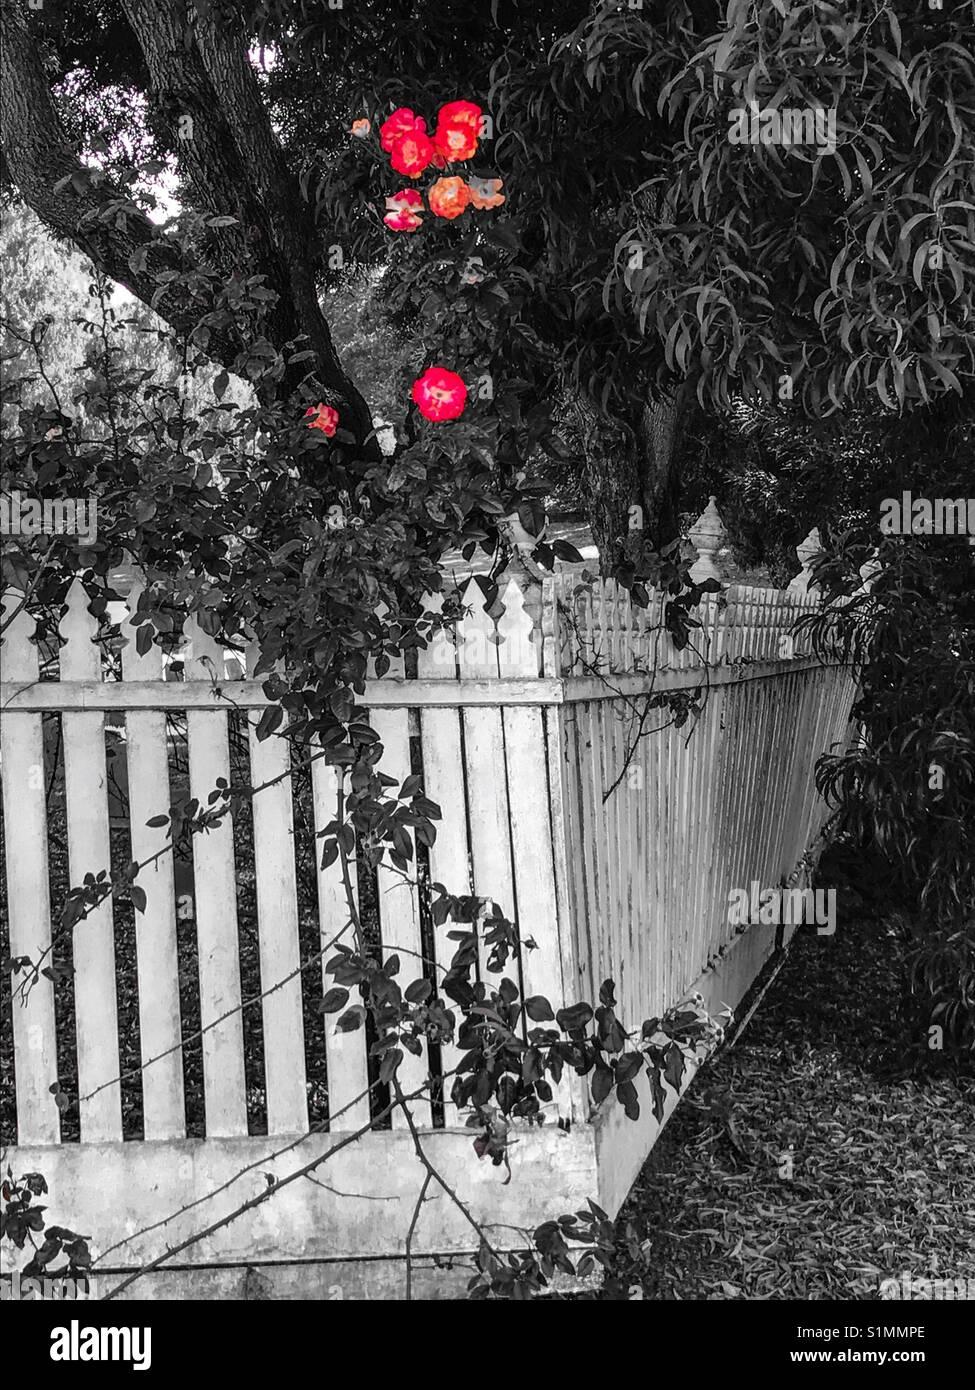 White picket fence & roses - Stock Image